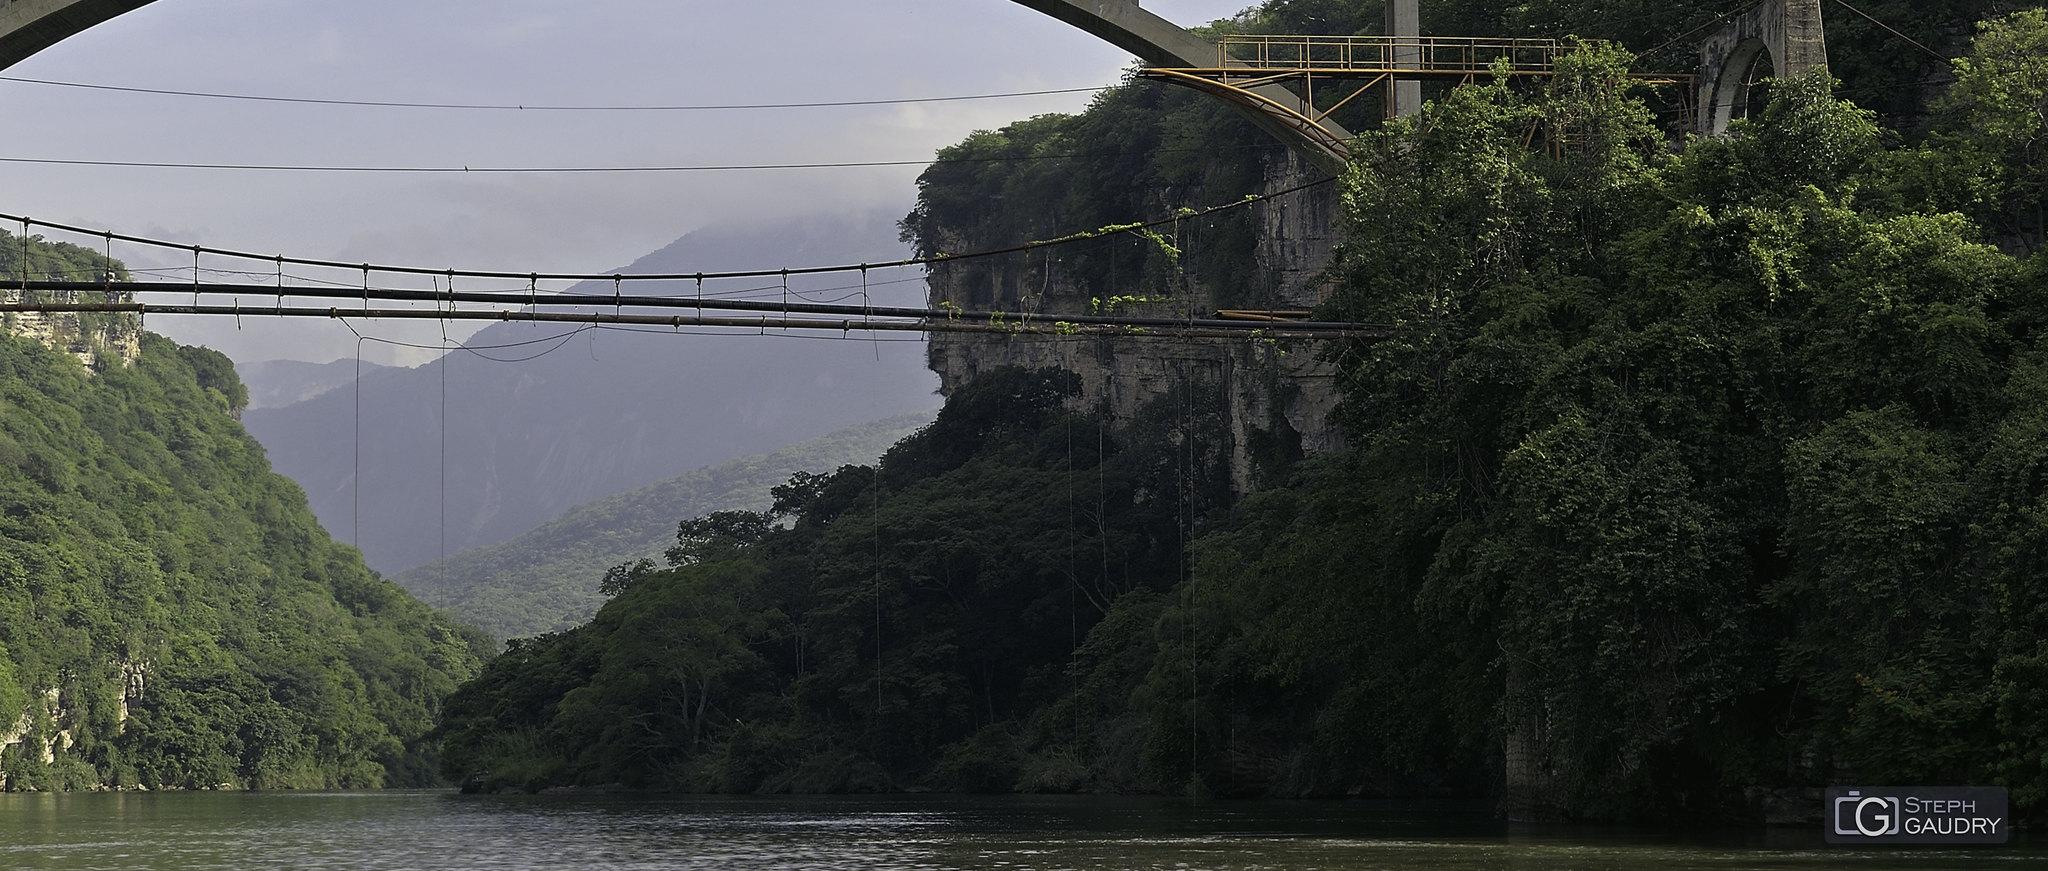 Río Grijalva - le plongeoir des fous [Click to start slideshow]